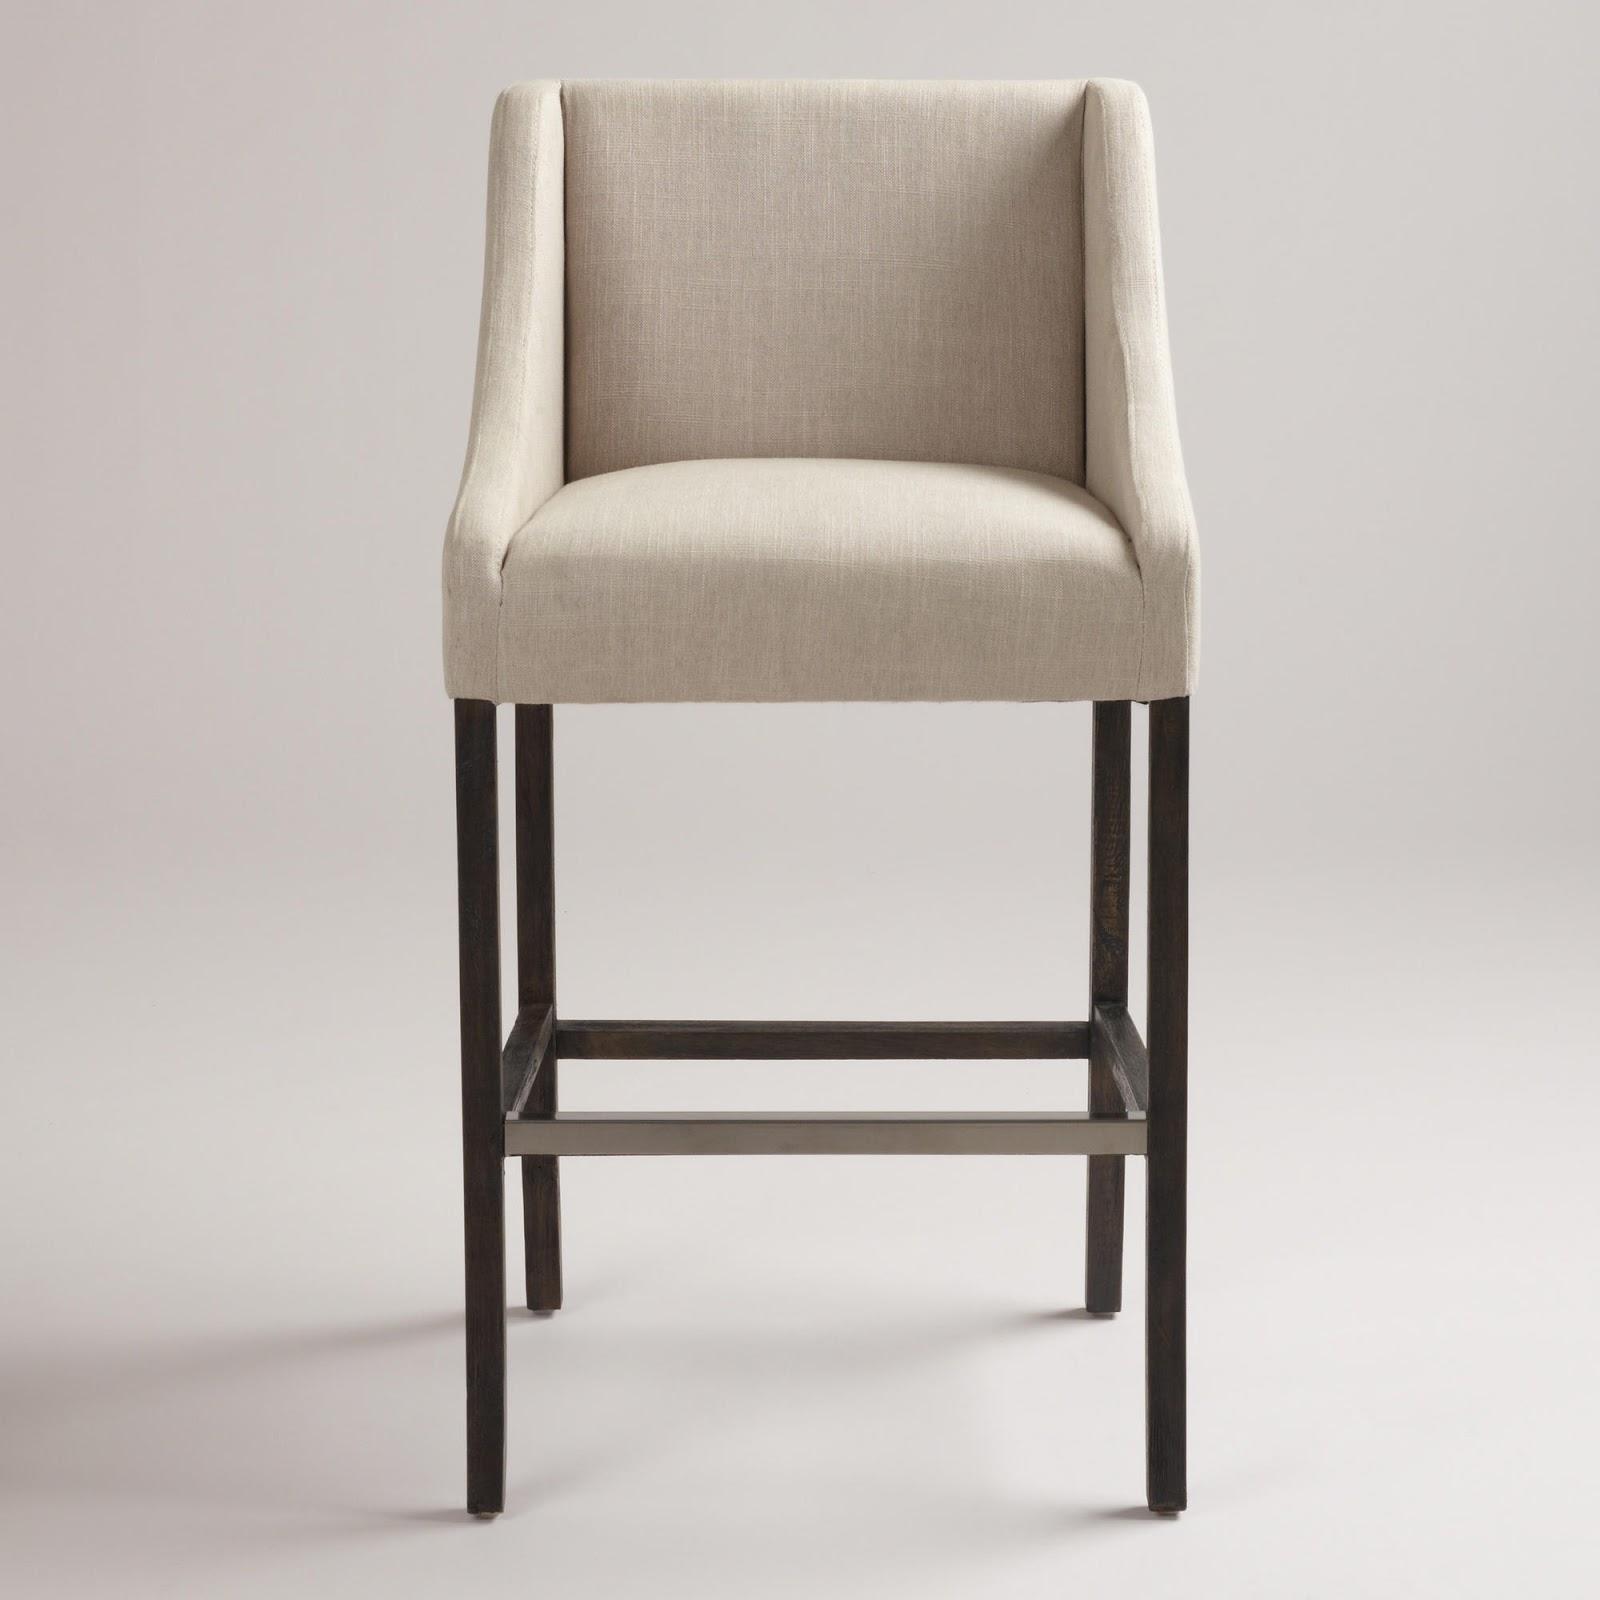 French upholstered barrelback counter stool decor look alikes